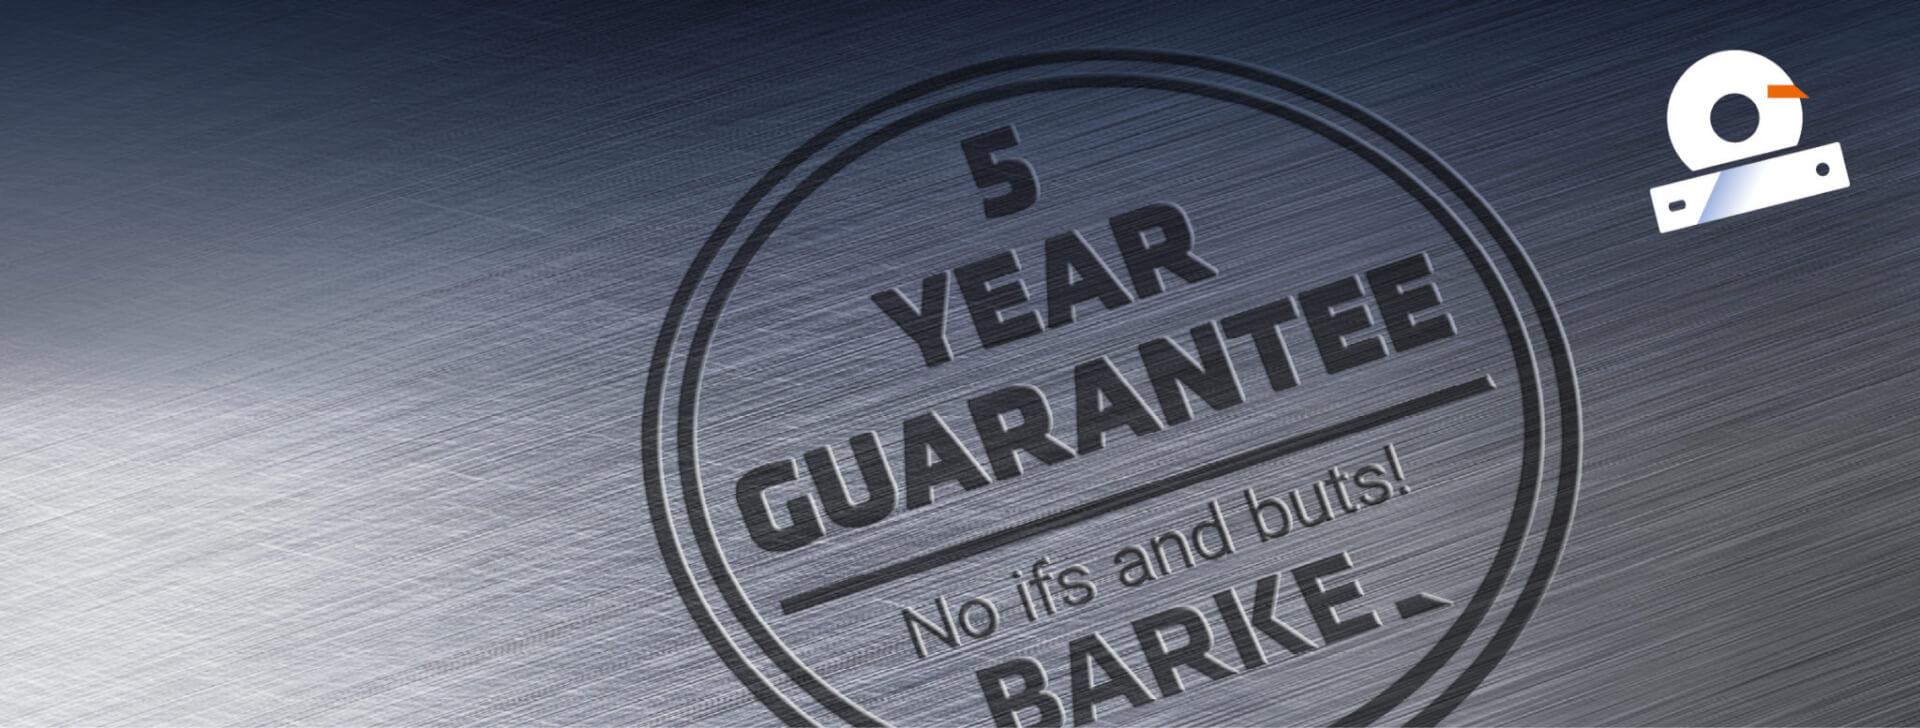 5 year guarantee en